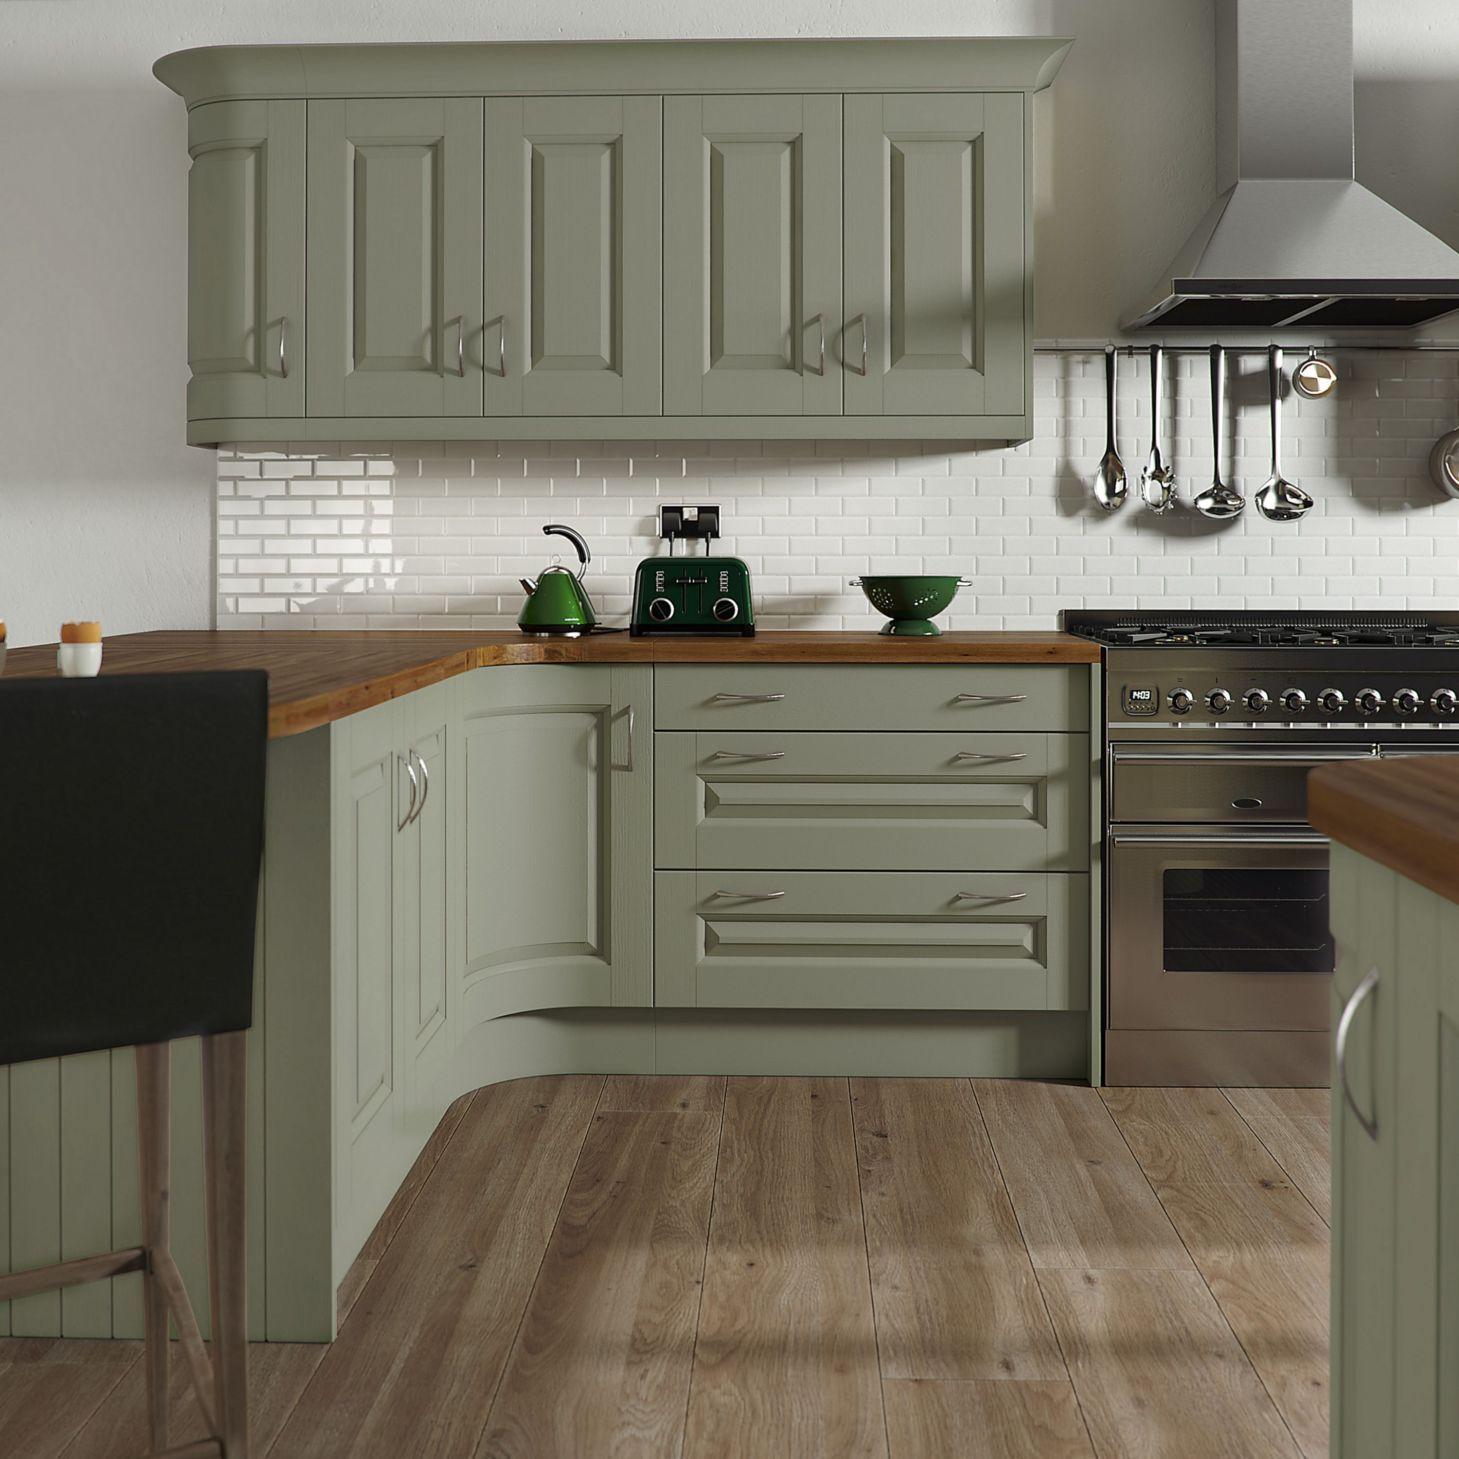 Top 20 Simple Sage Kitchen Cabinets Design Idea For Kitchen Inspiration Sage Kitchen Kitchen Renovation Kitchen Remodel